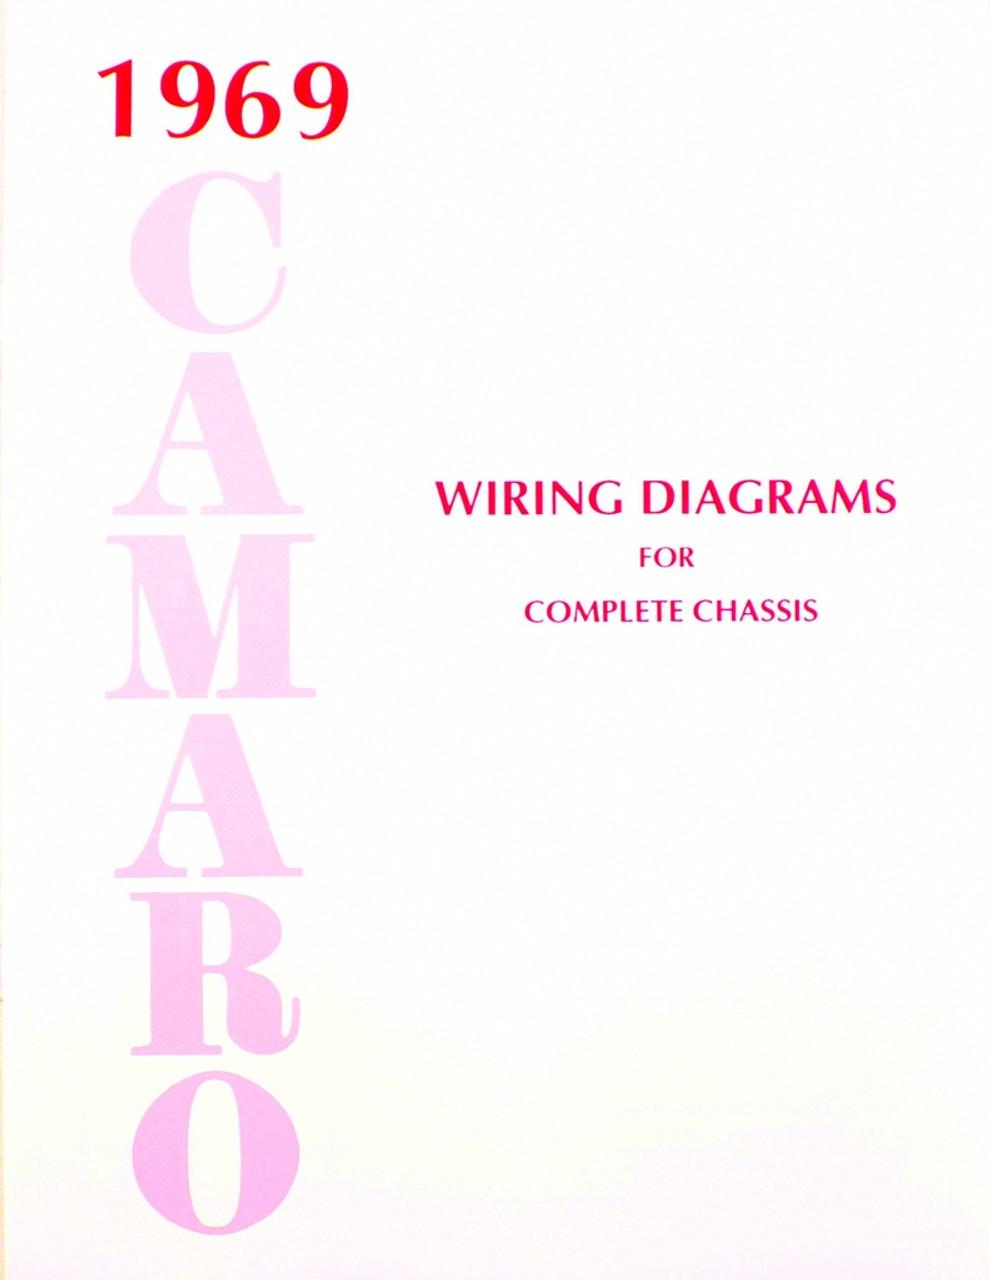 69 Chevy Camaro Electrical Wiring Diagram Manual 1969